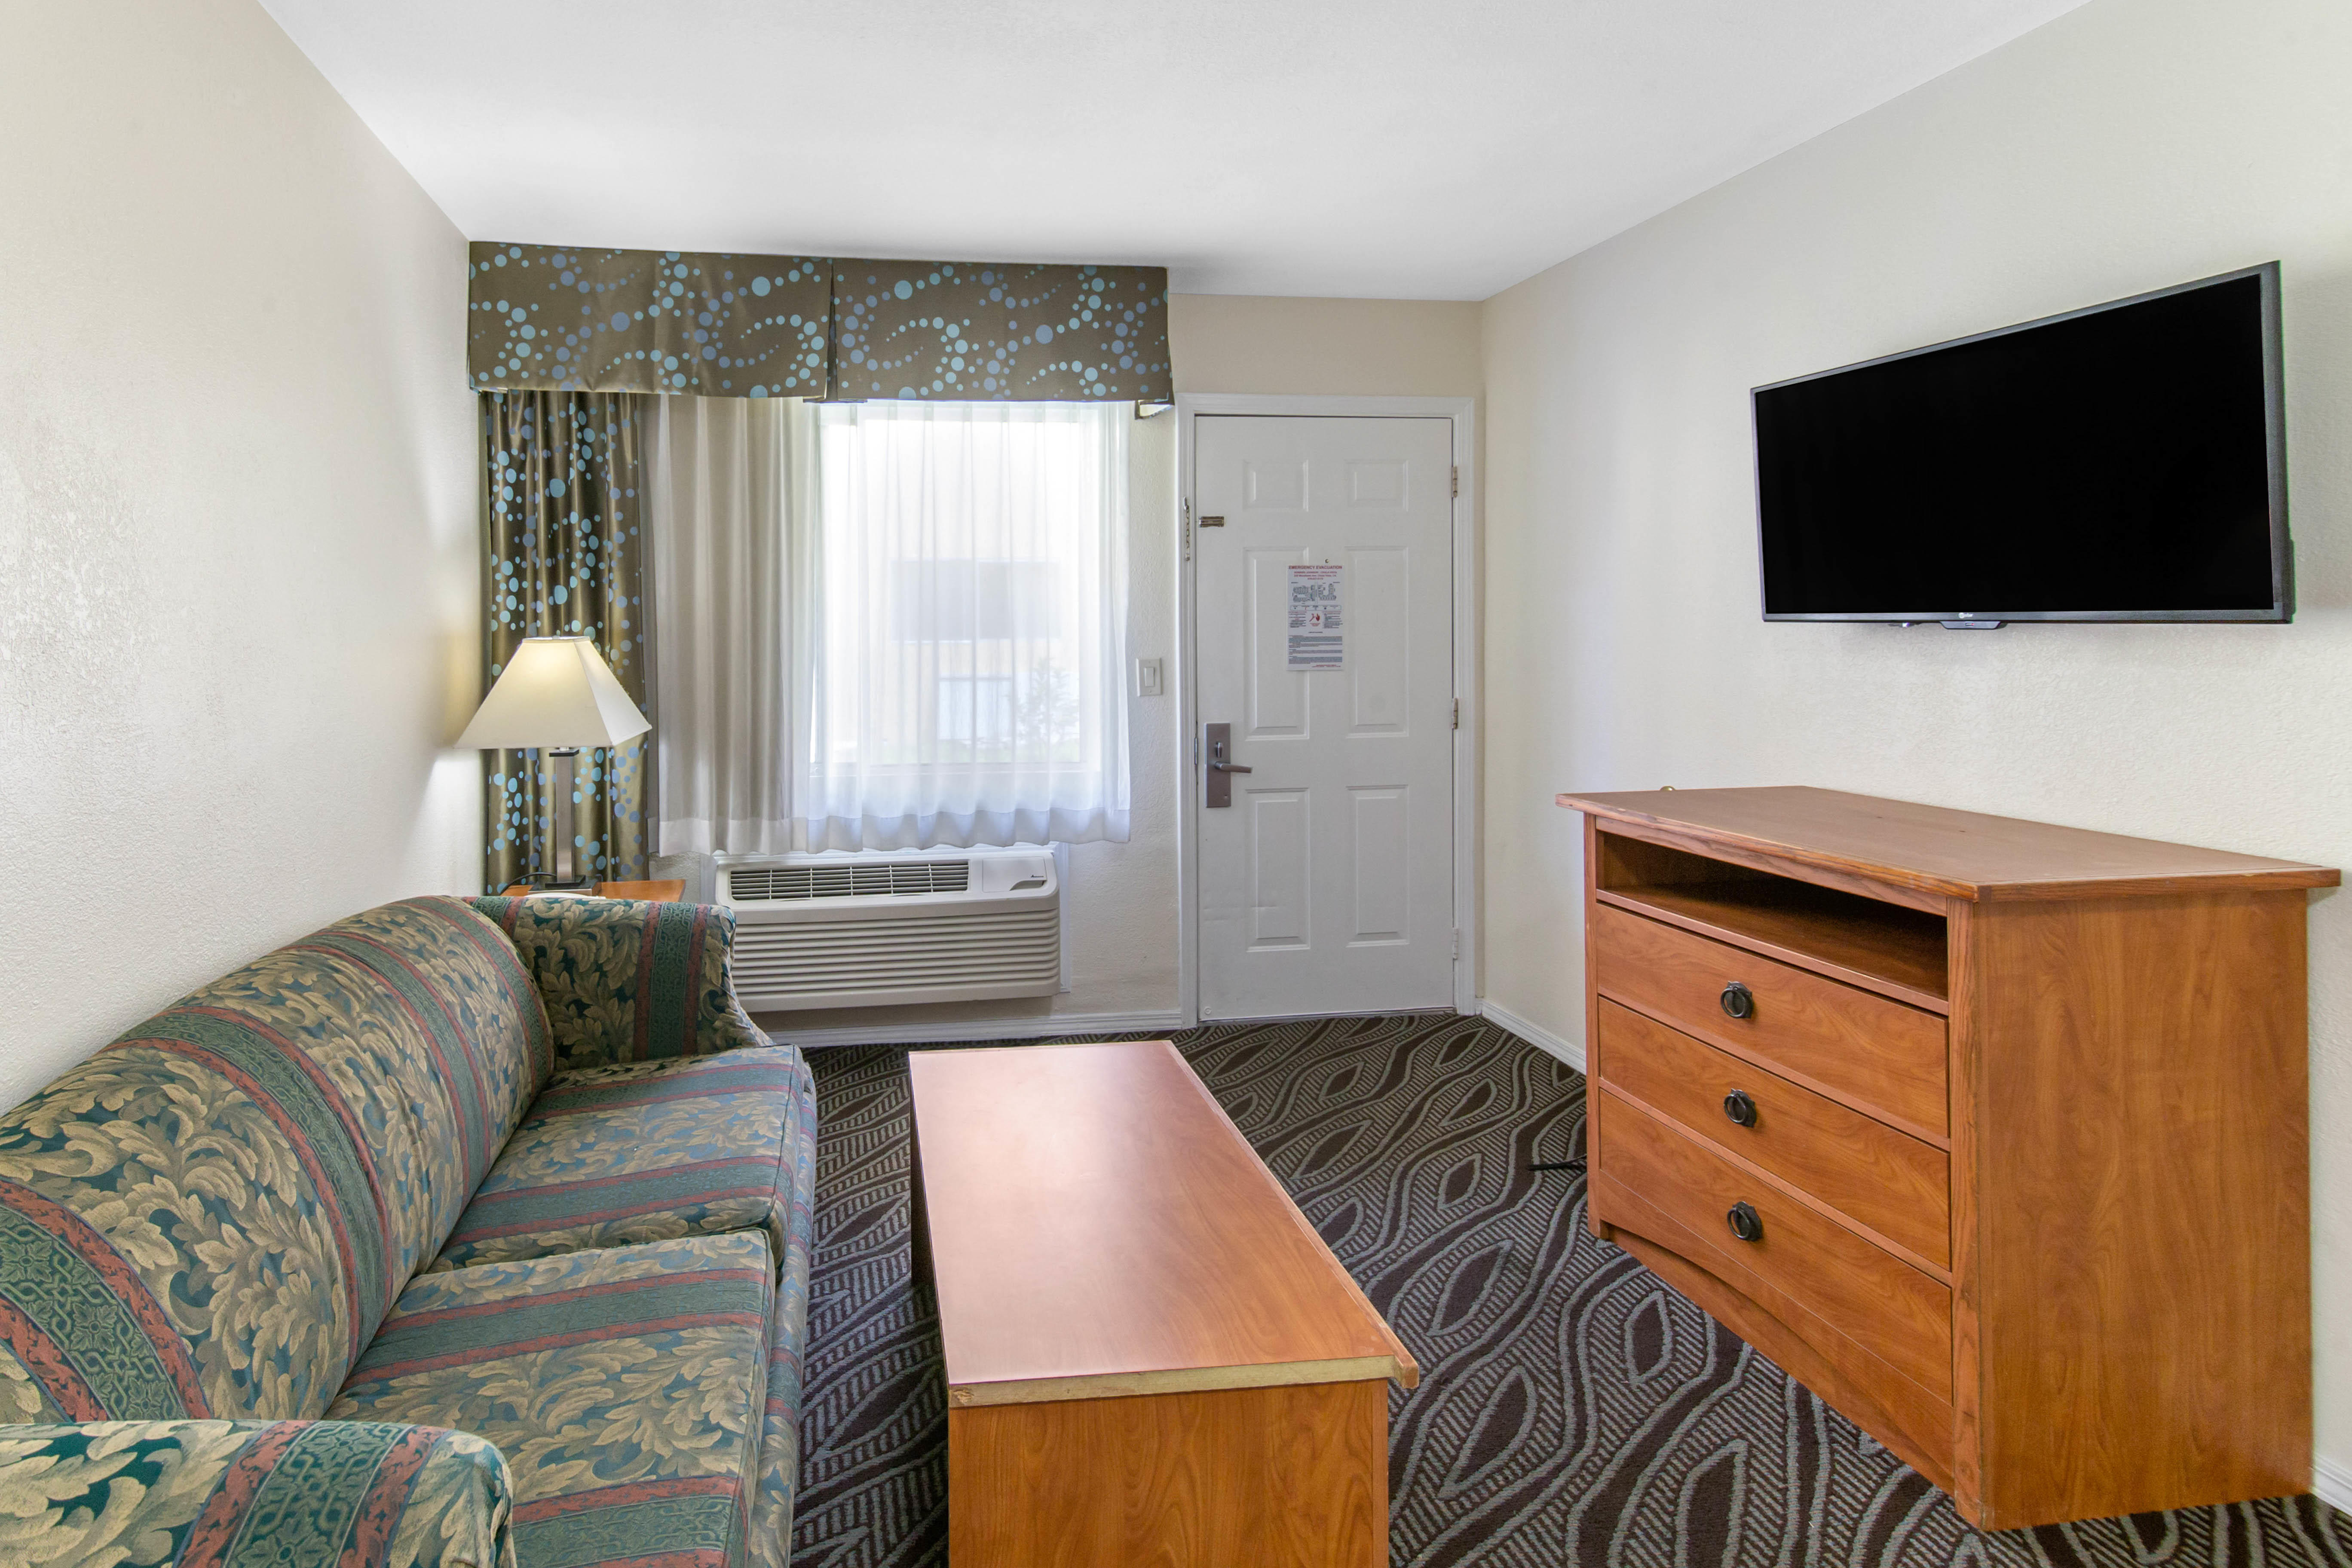 Howard Johnson by Wyndham Chula Vista San Diego Suite Hotel image 11